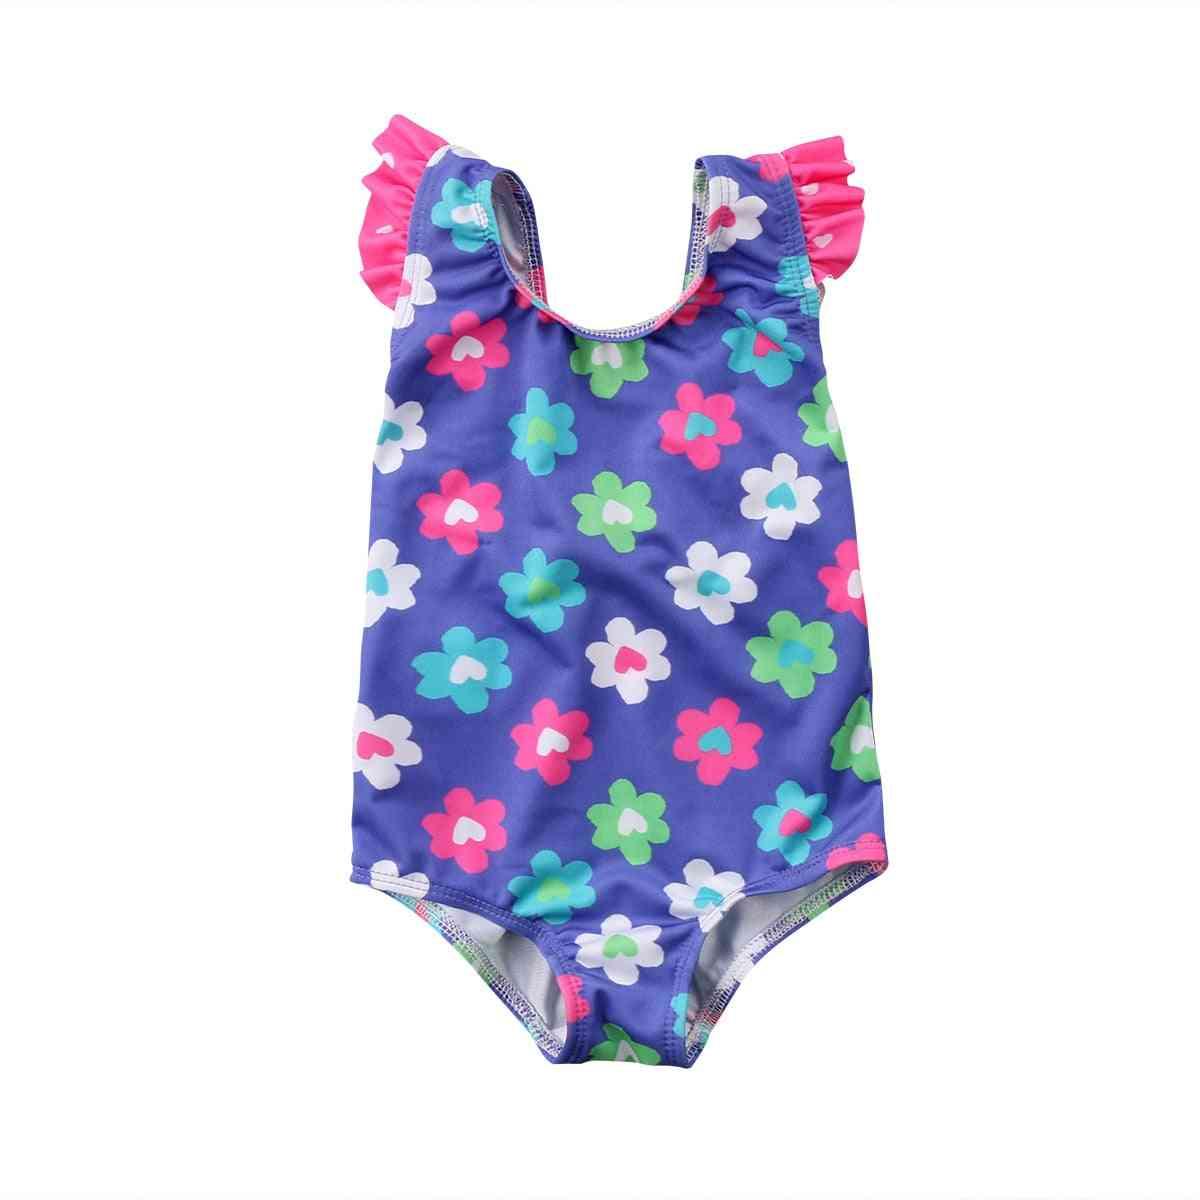 Cute Newborn Baby Swimsuit Princess Flower Swimwear